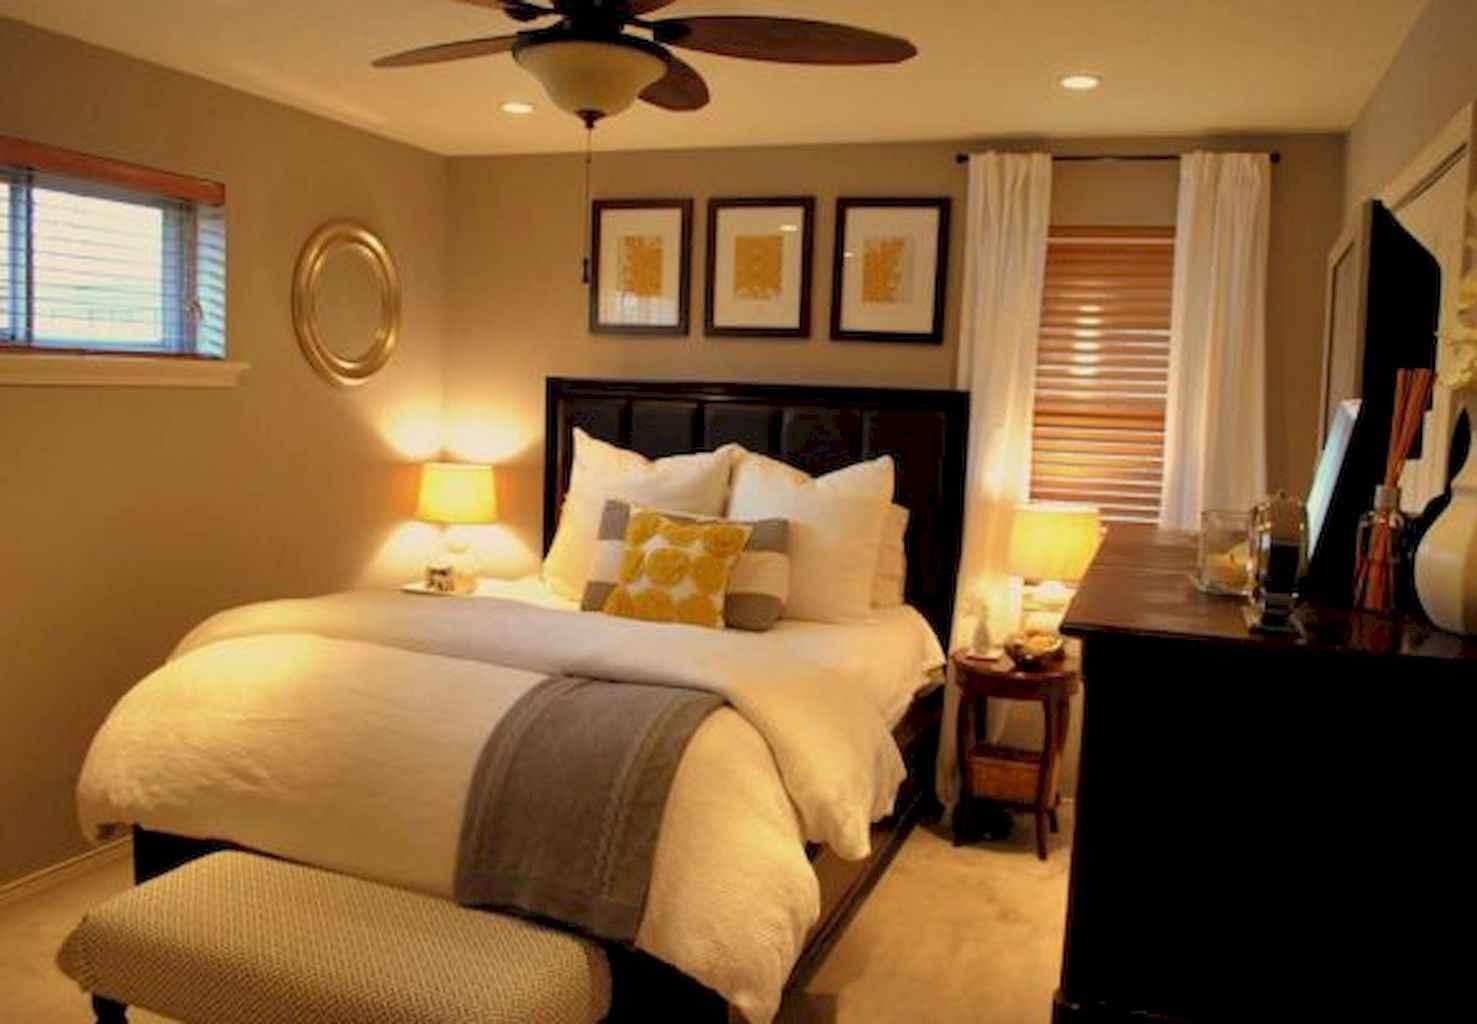 Incredible master bedroom ideas (54)